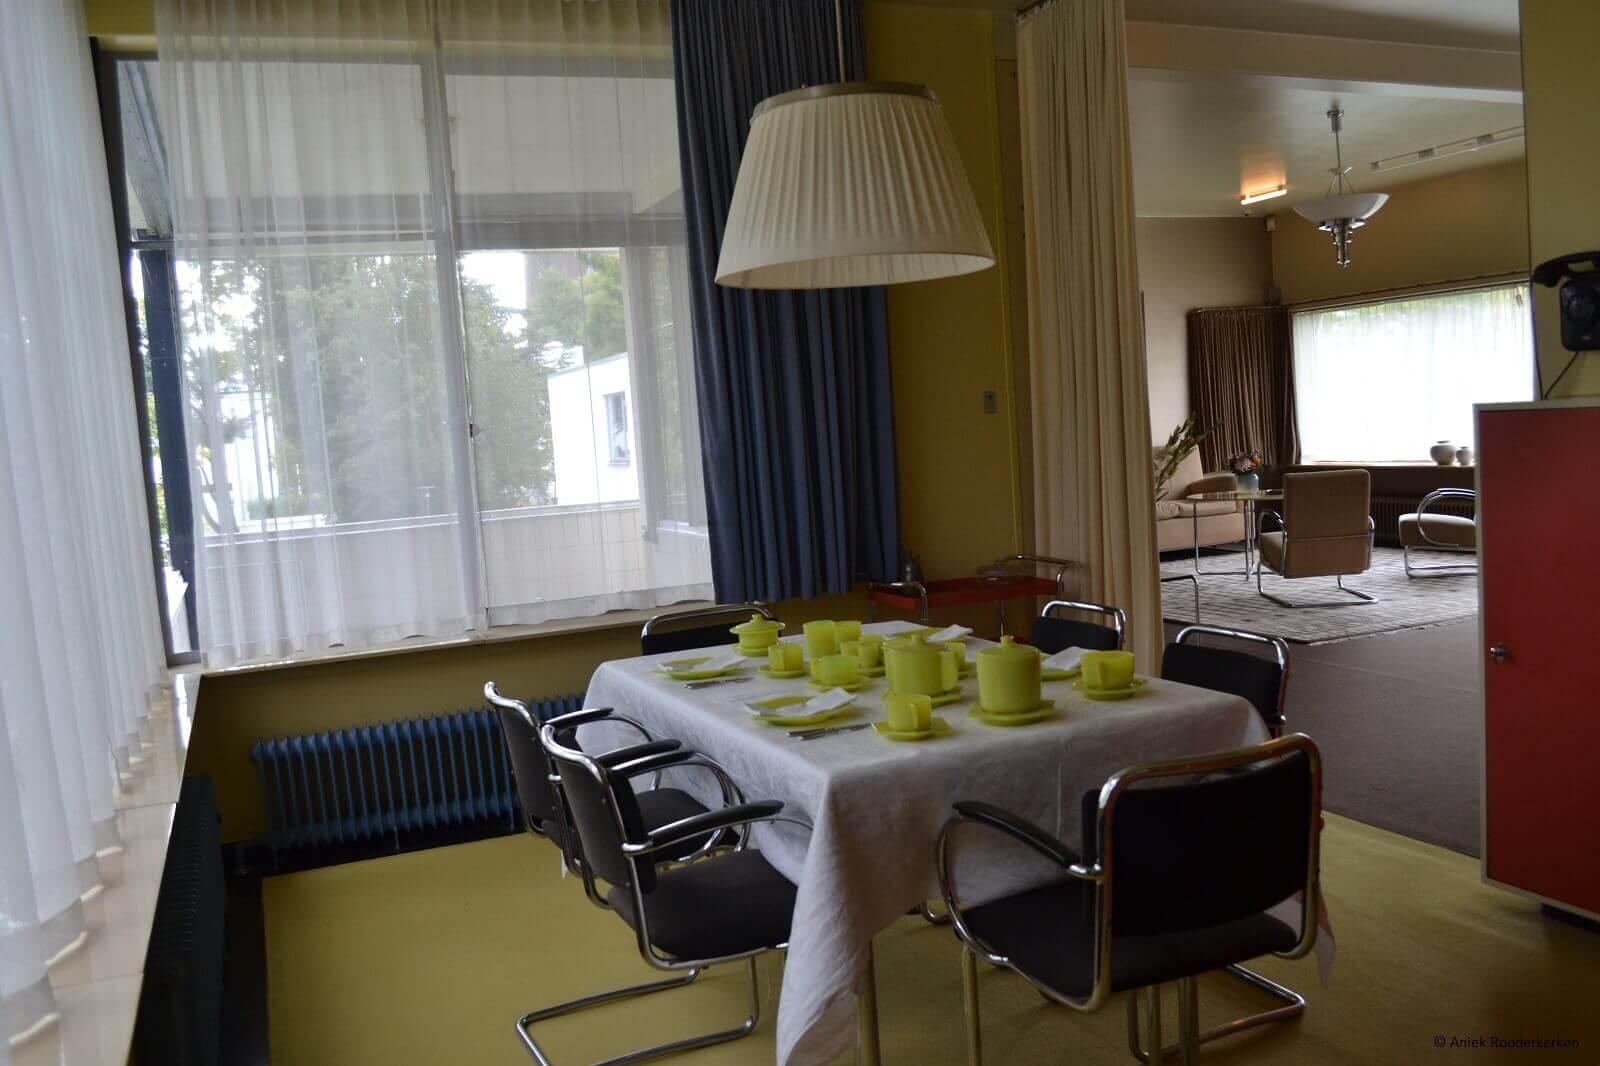 Eetkamer in Huis Sonneveld in Rotterdam